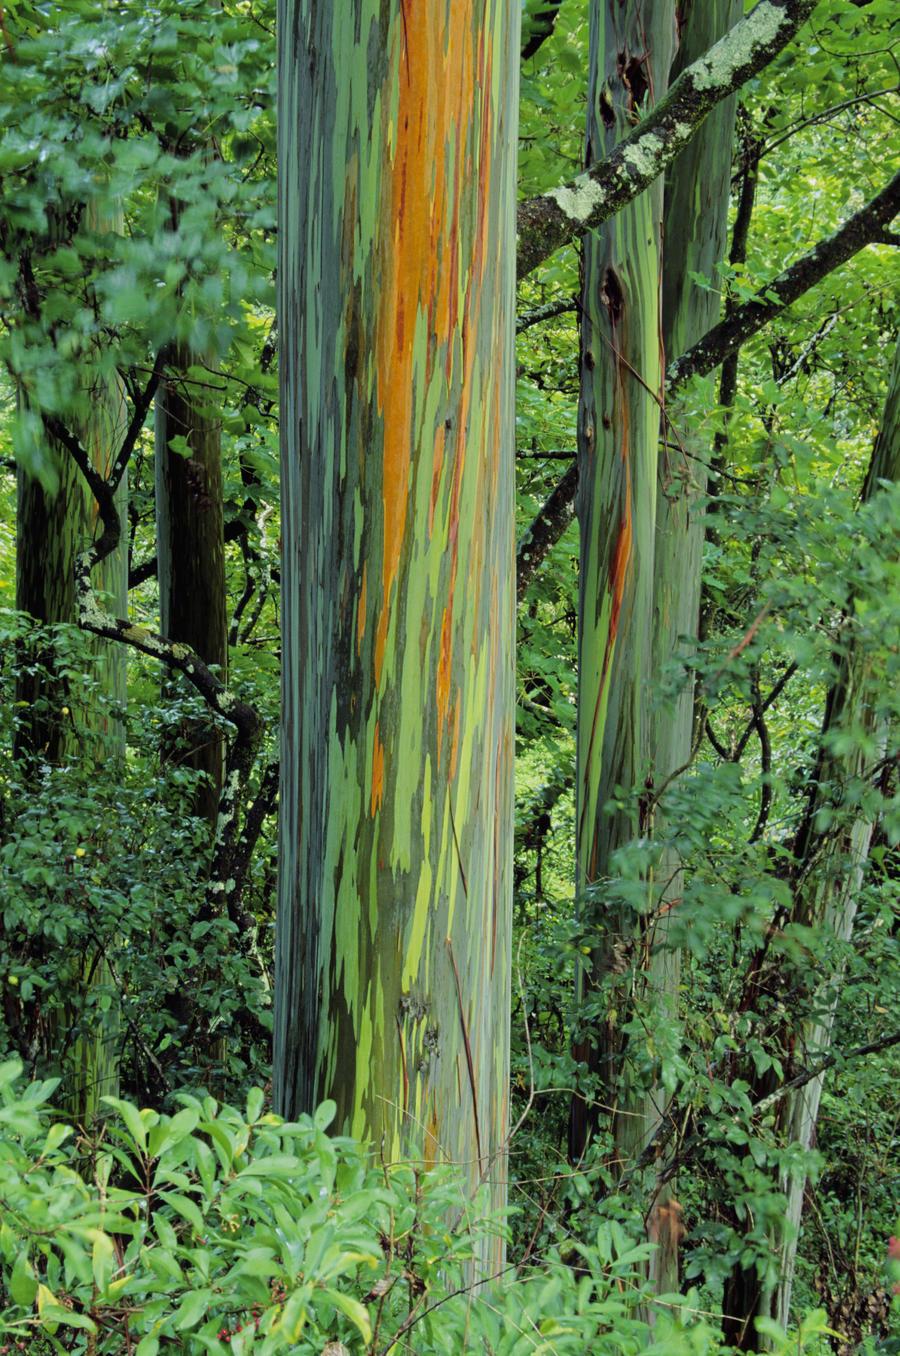 hawaii maui hana rainbow eucalyptus tree trunk pacificstock canvas